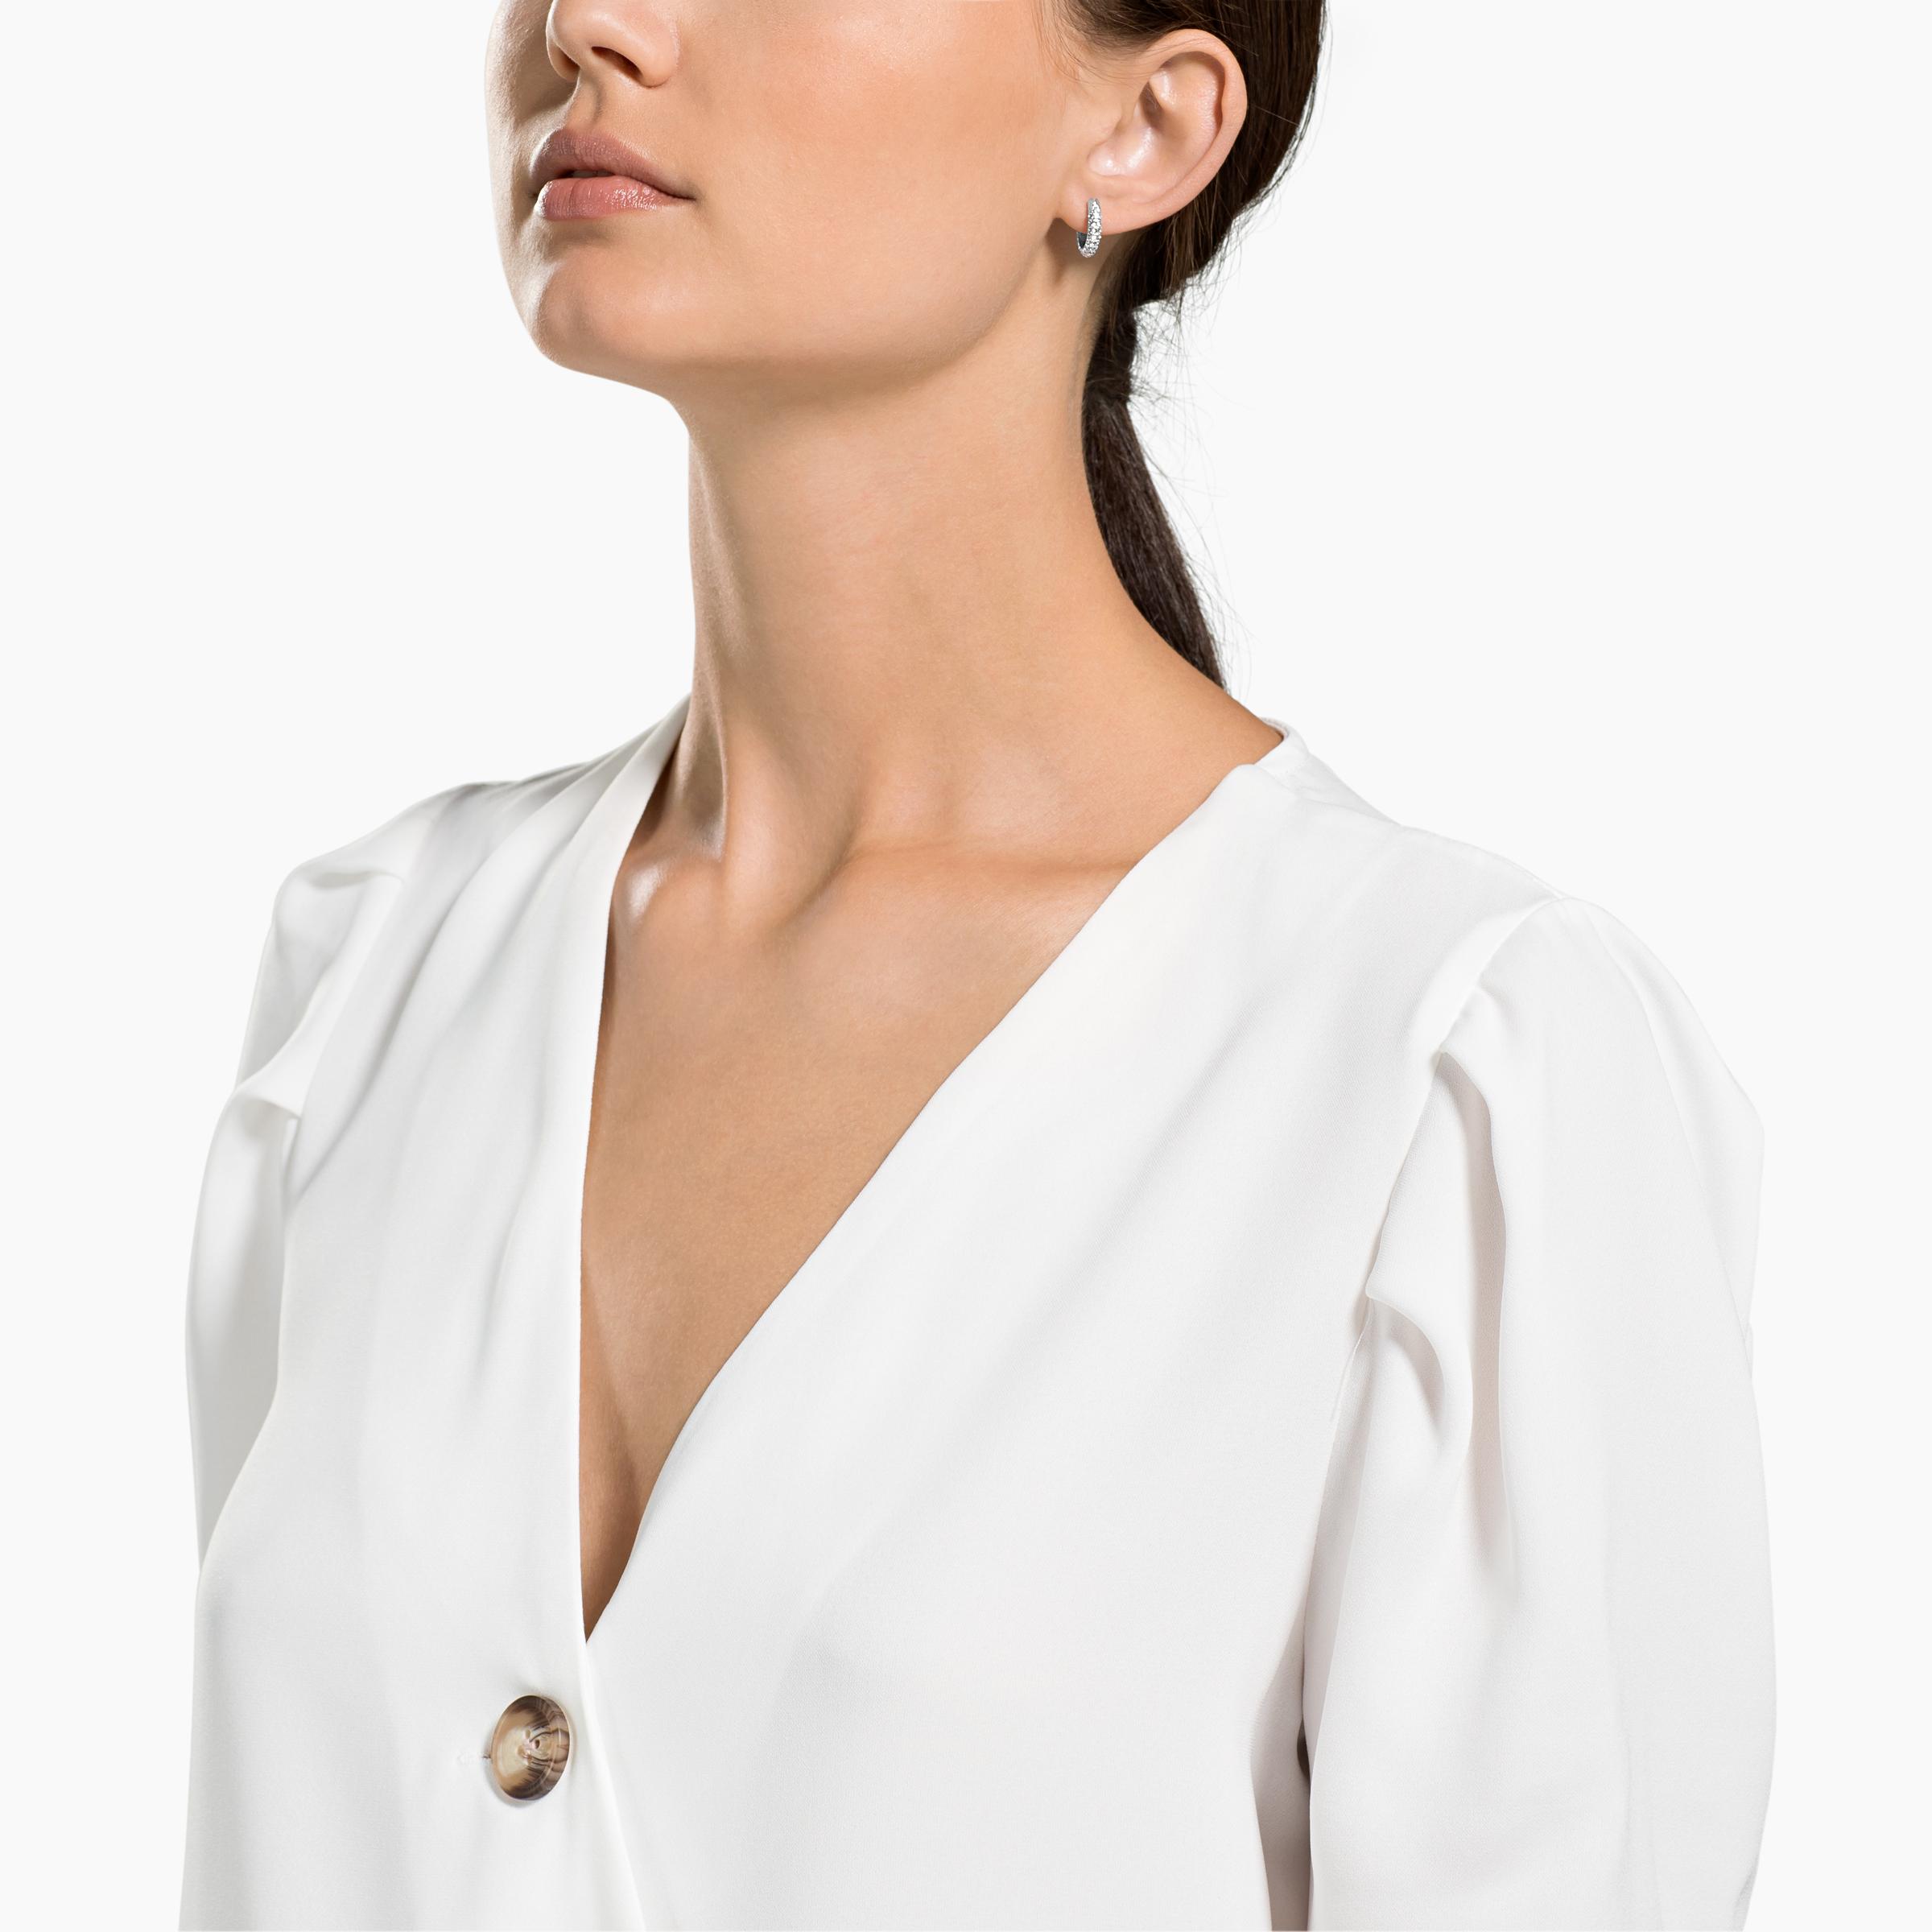 Stone Pierced Earrings, Small, White, Rhodium Plating